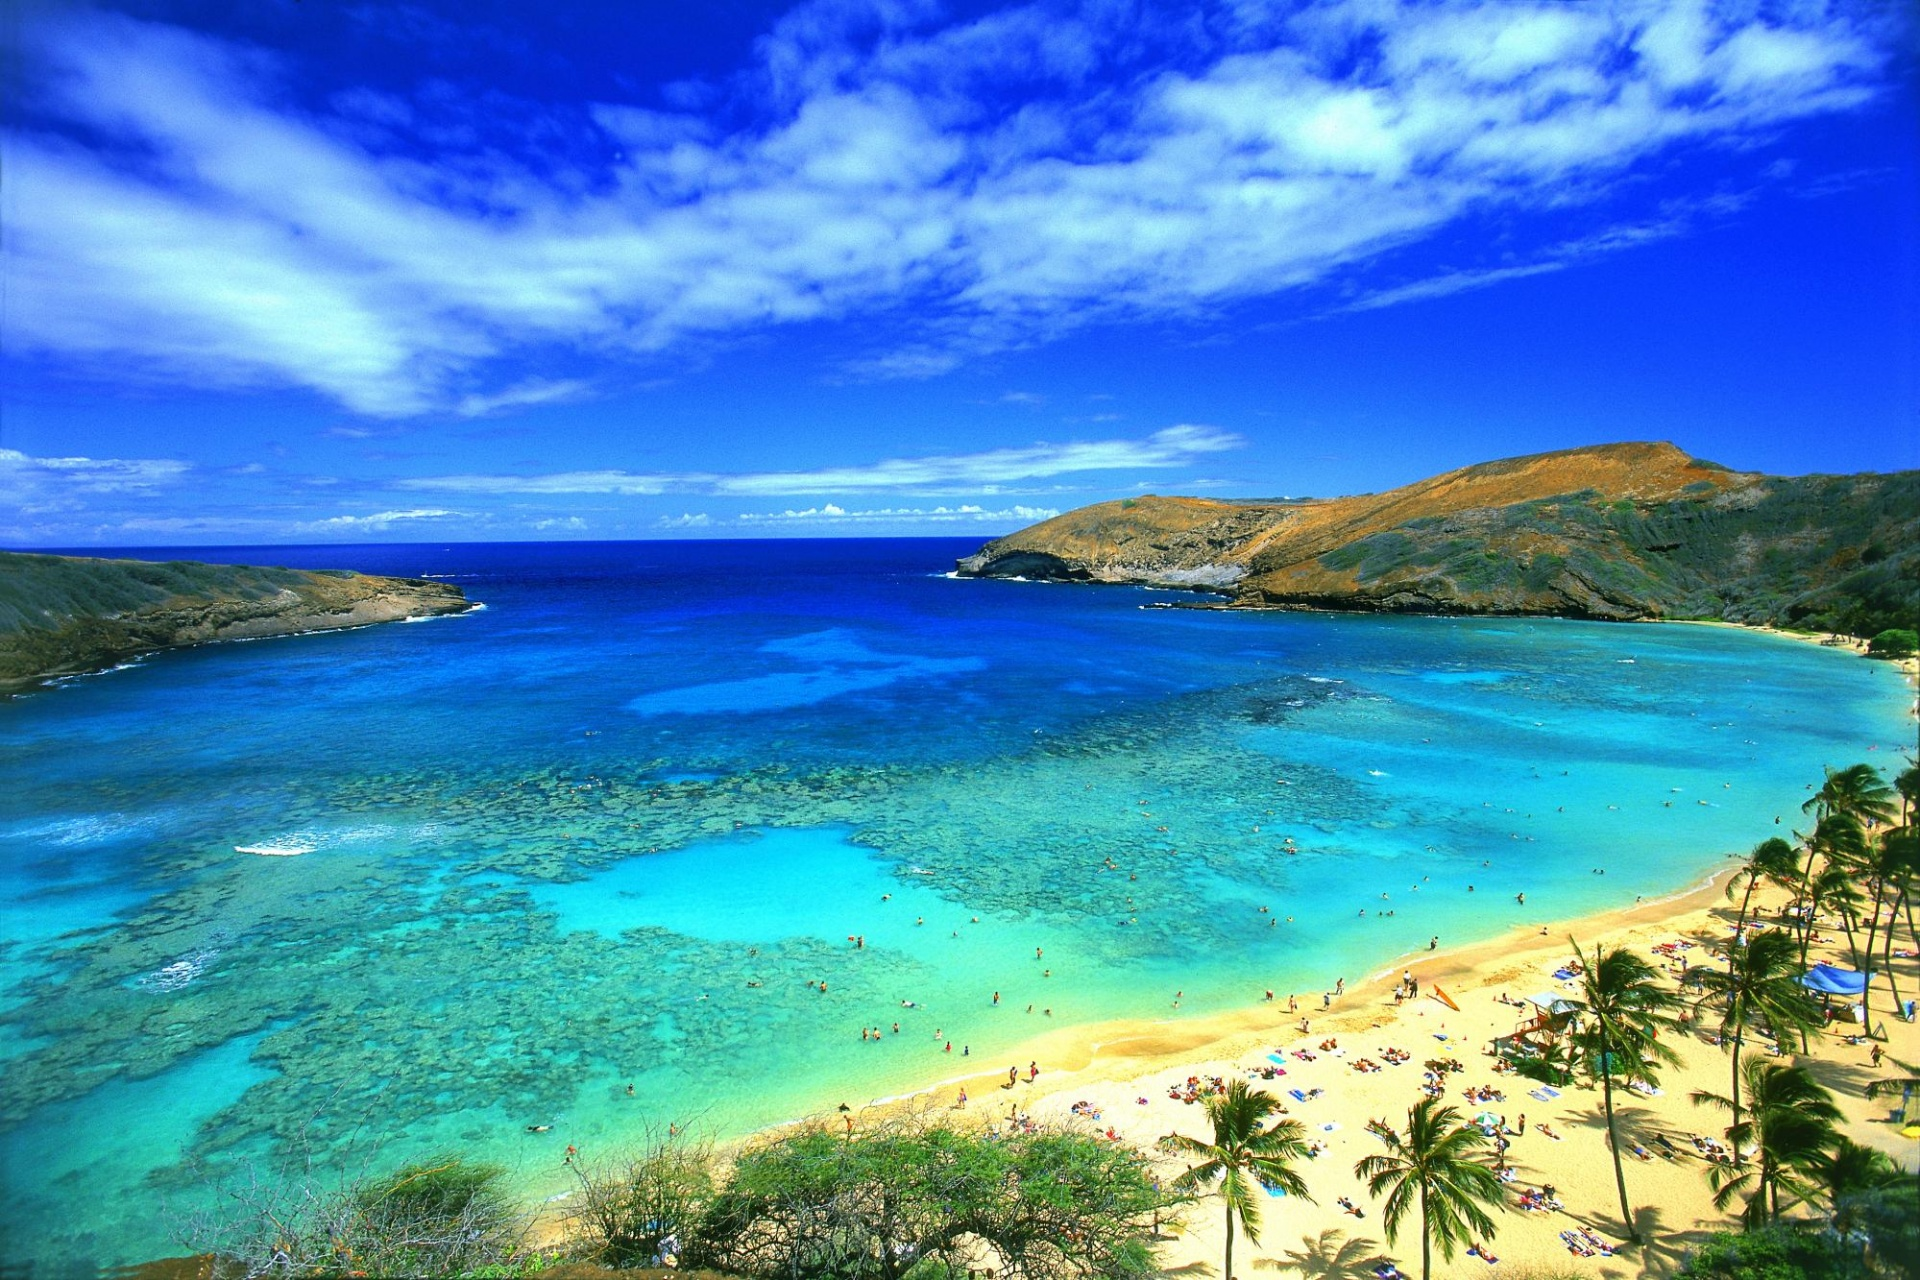 summer-beach-paradise-wallpaper-hd-cool